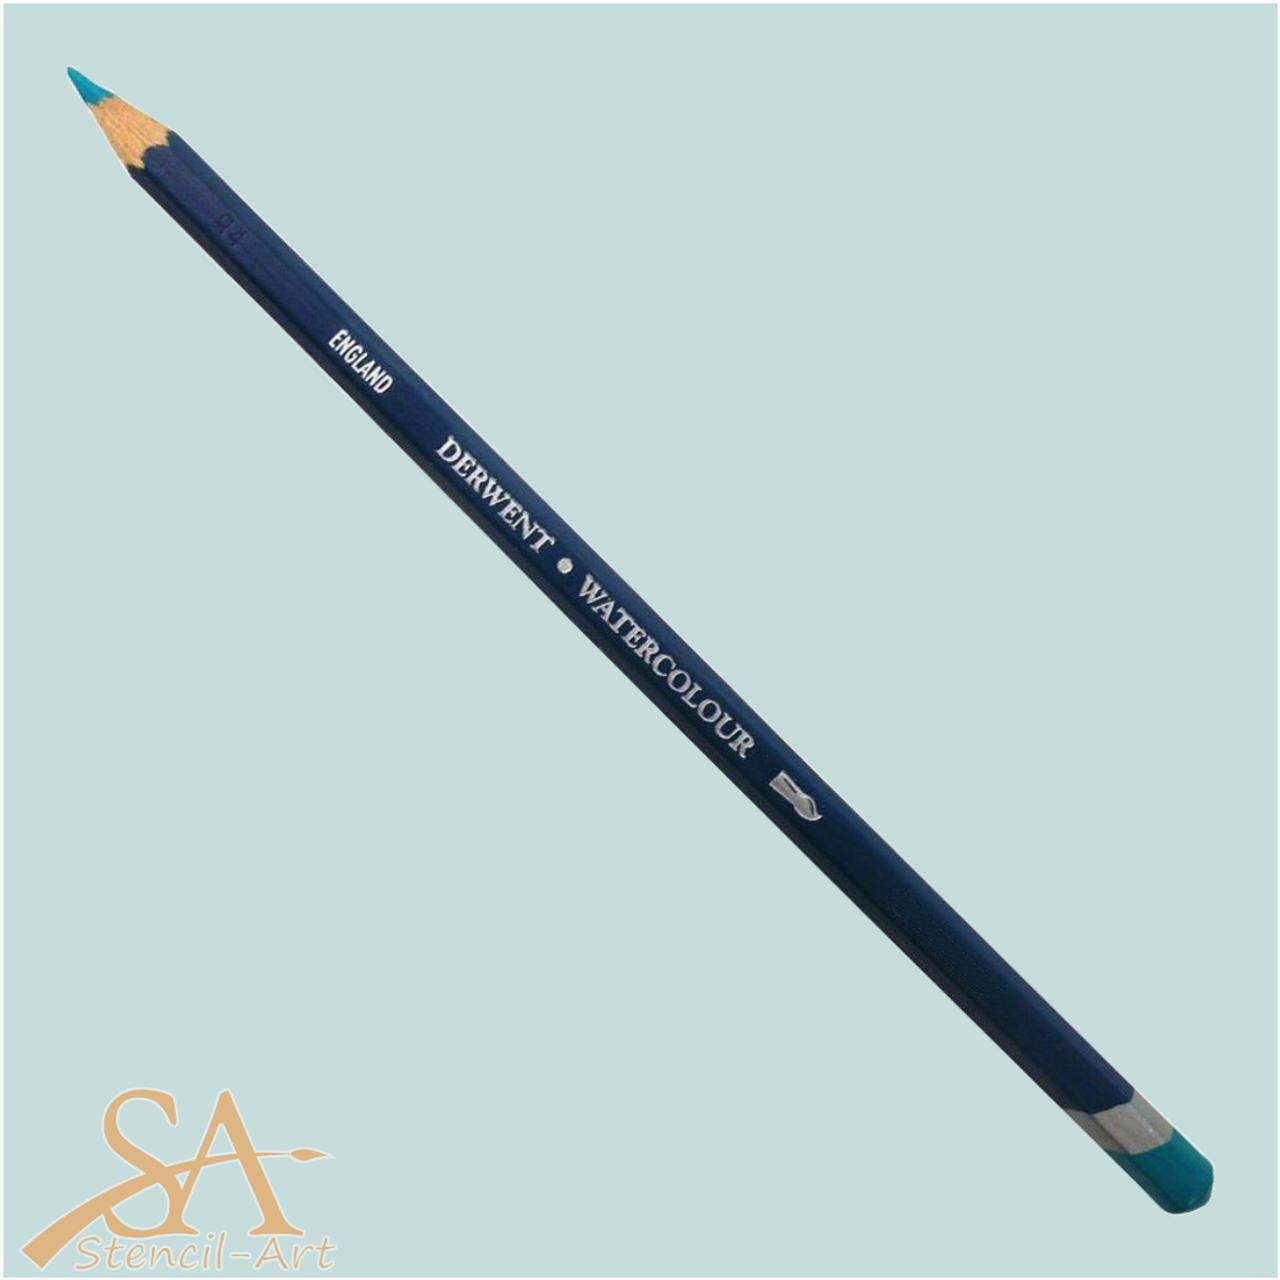 Derwent Watercolour Pencil  - Silver Grey #71